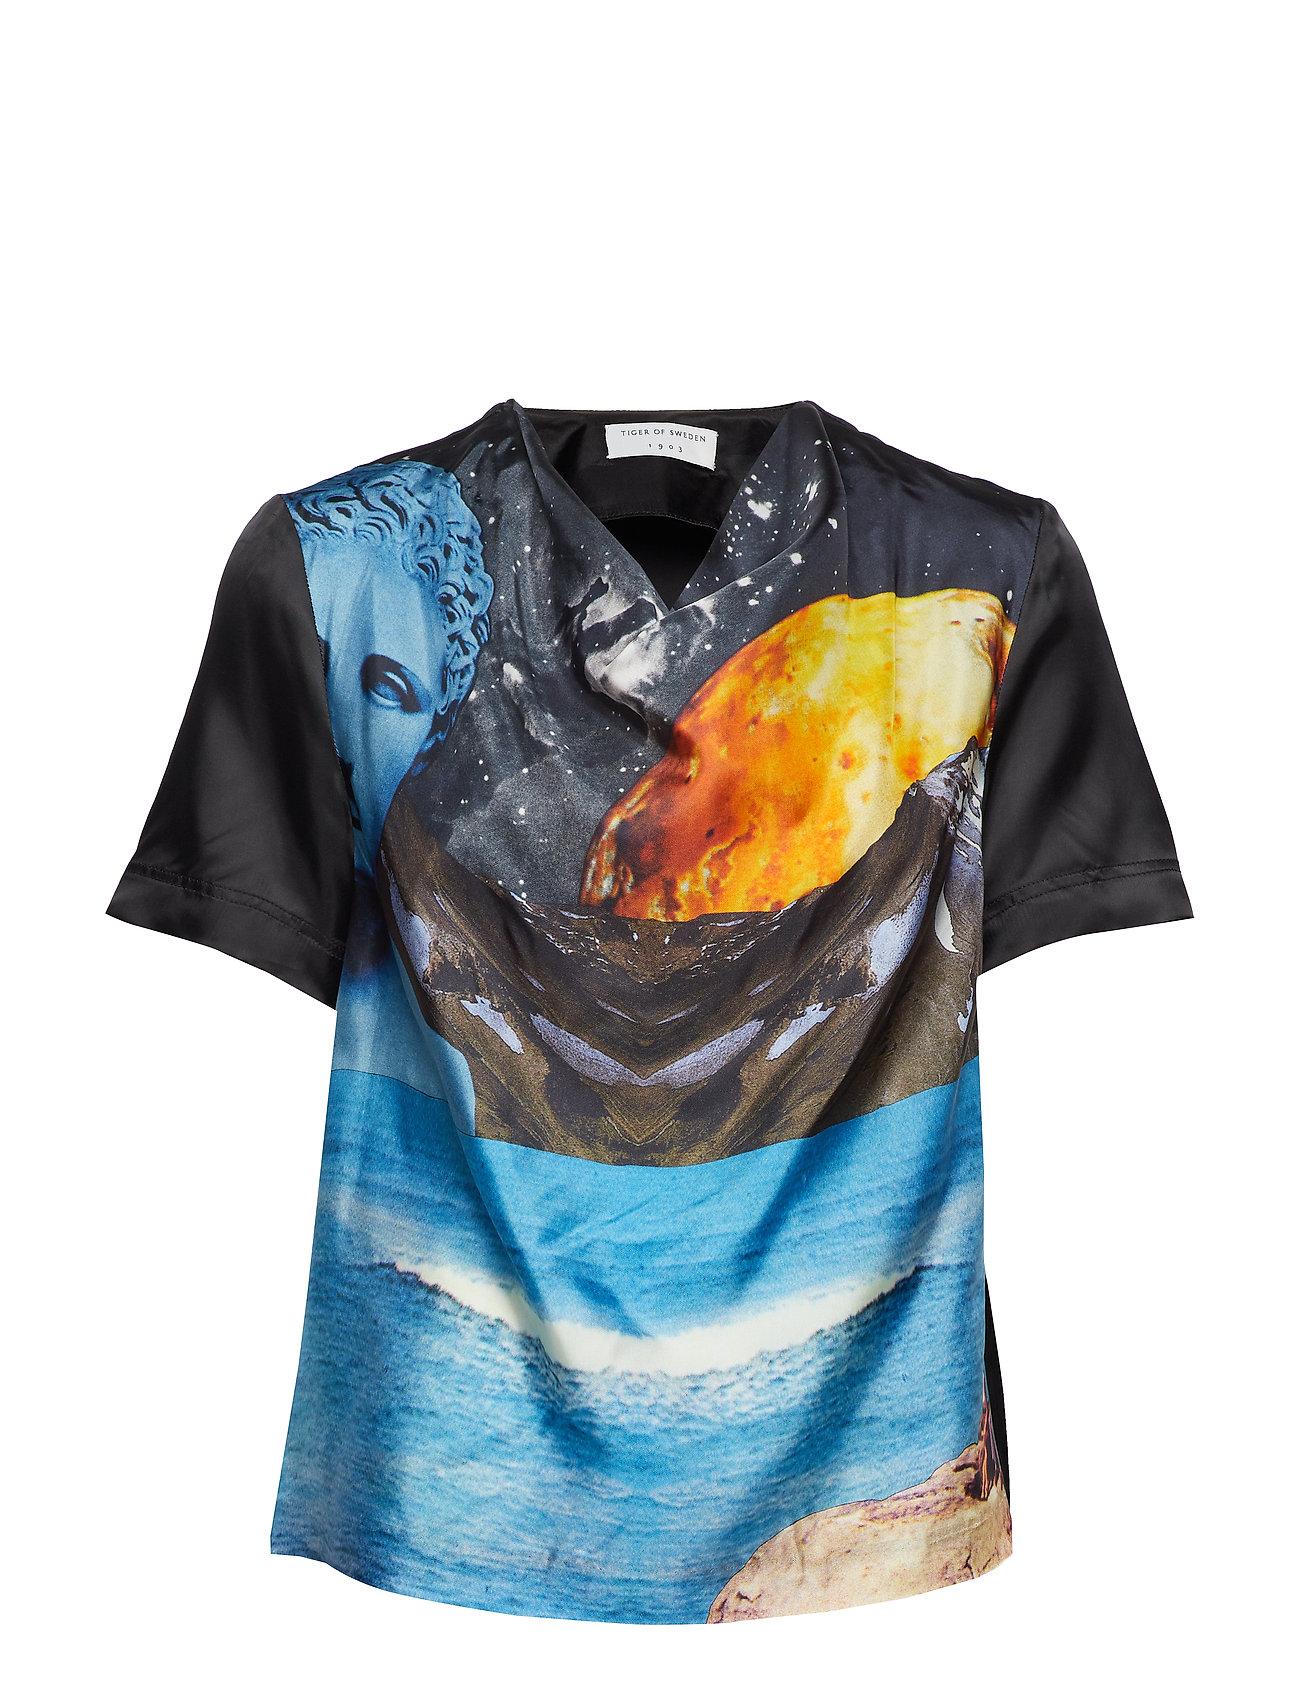 TIGER OF SWEDEN Troyes T-Shirt Top Bunt/gemustert TIGER OF SWEDEN